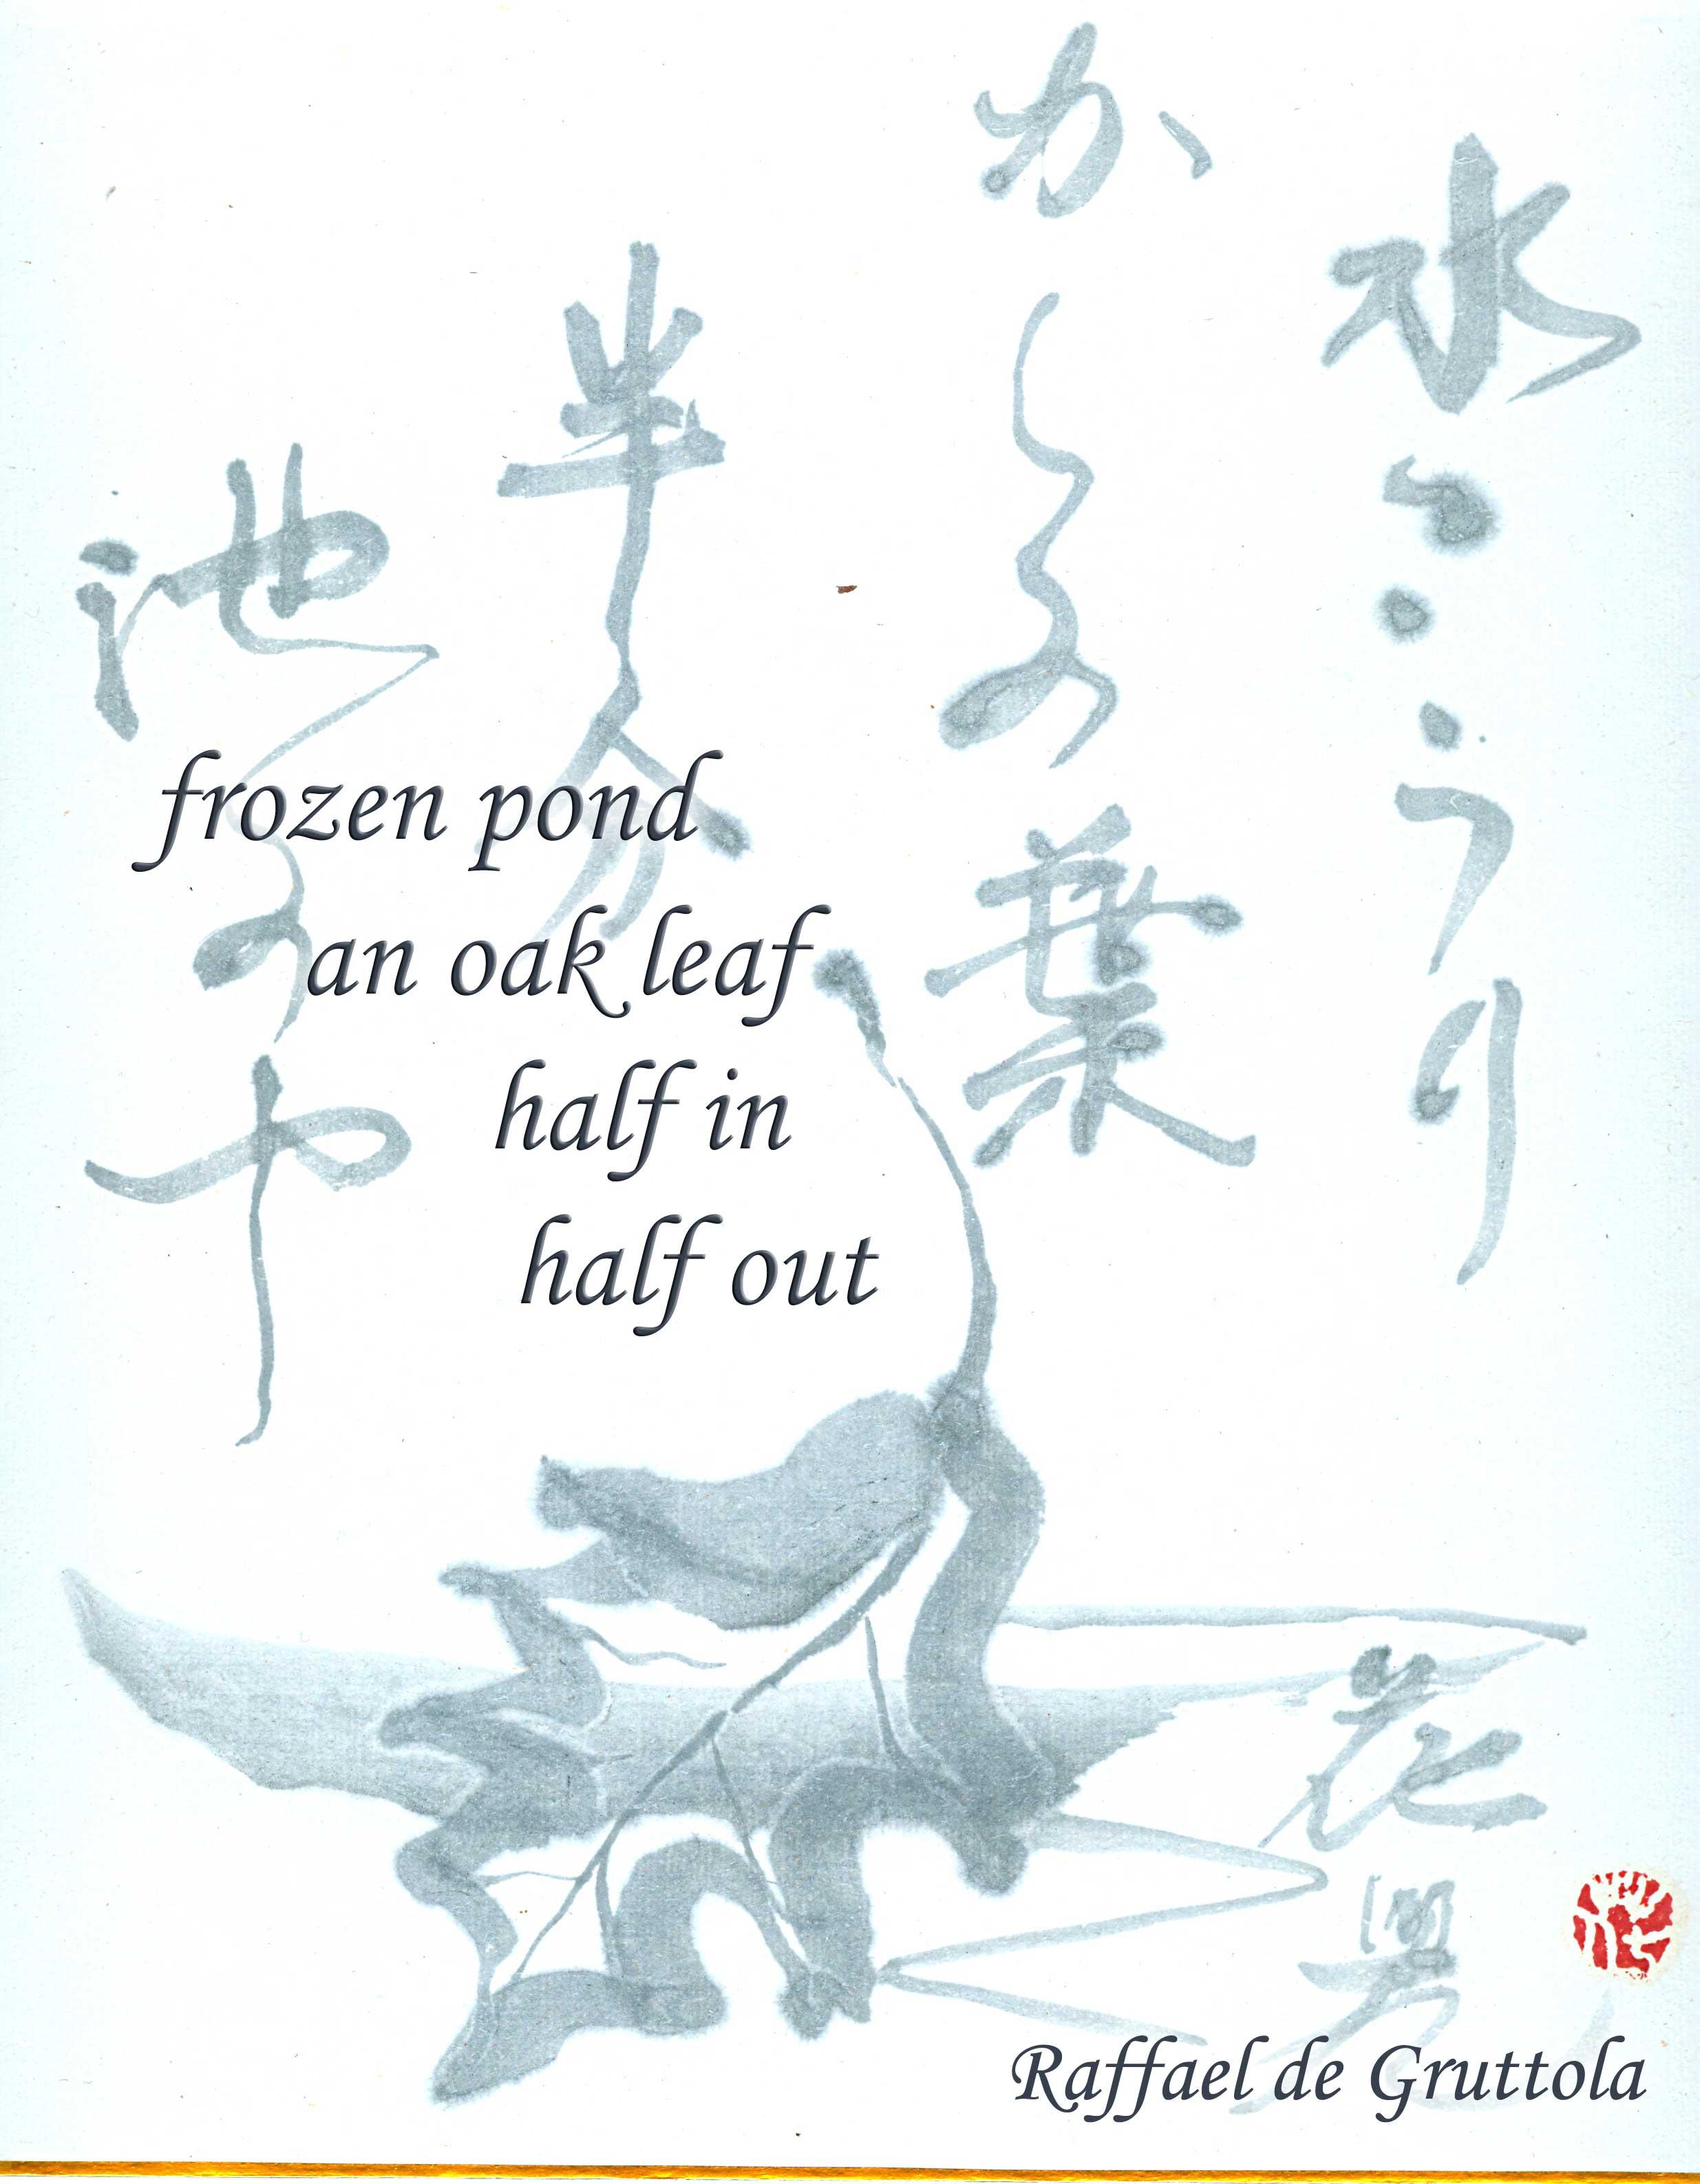 Hauki Poems #2: abdfc33b d014a7f232e5c9375f